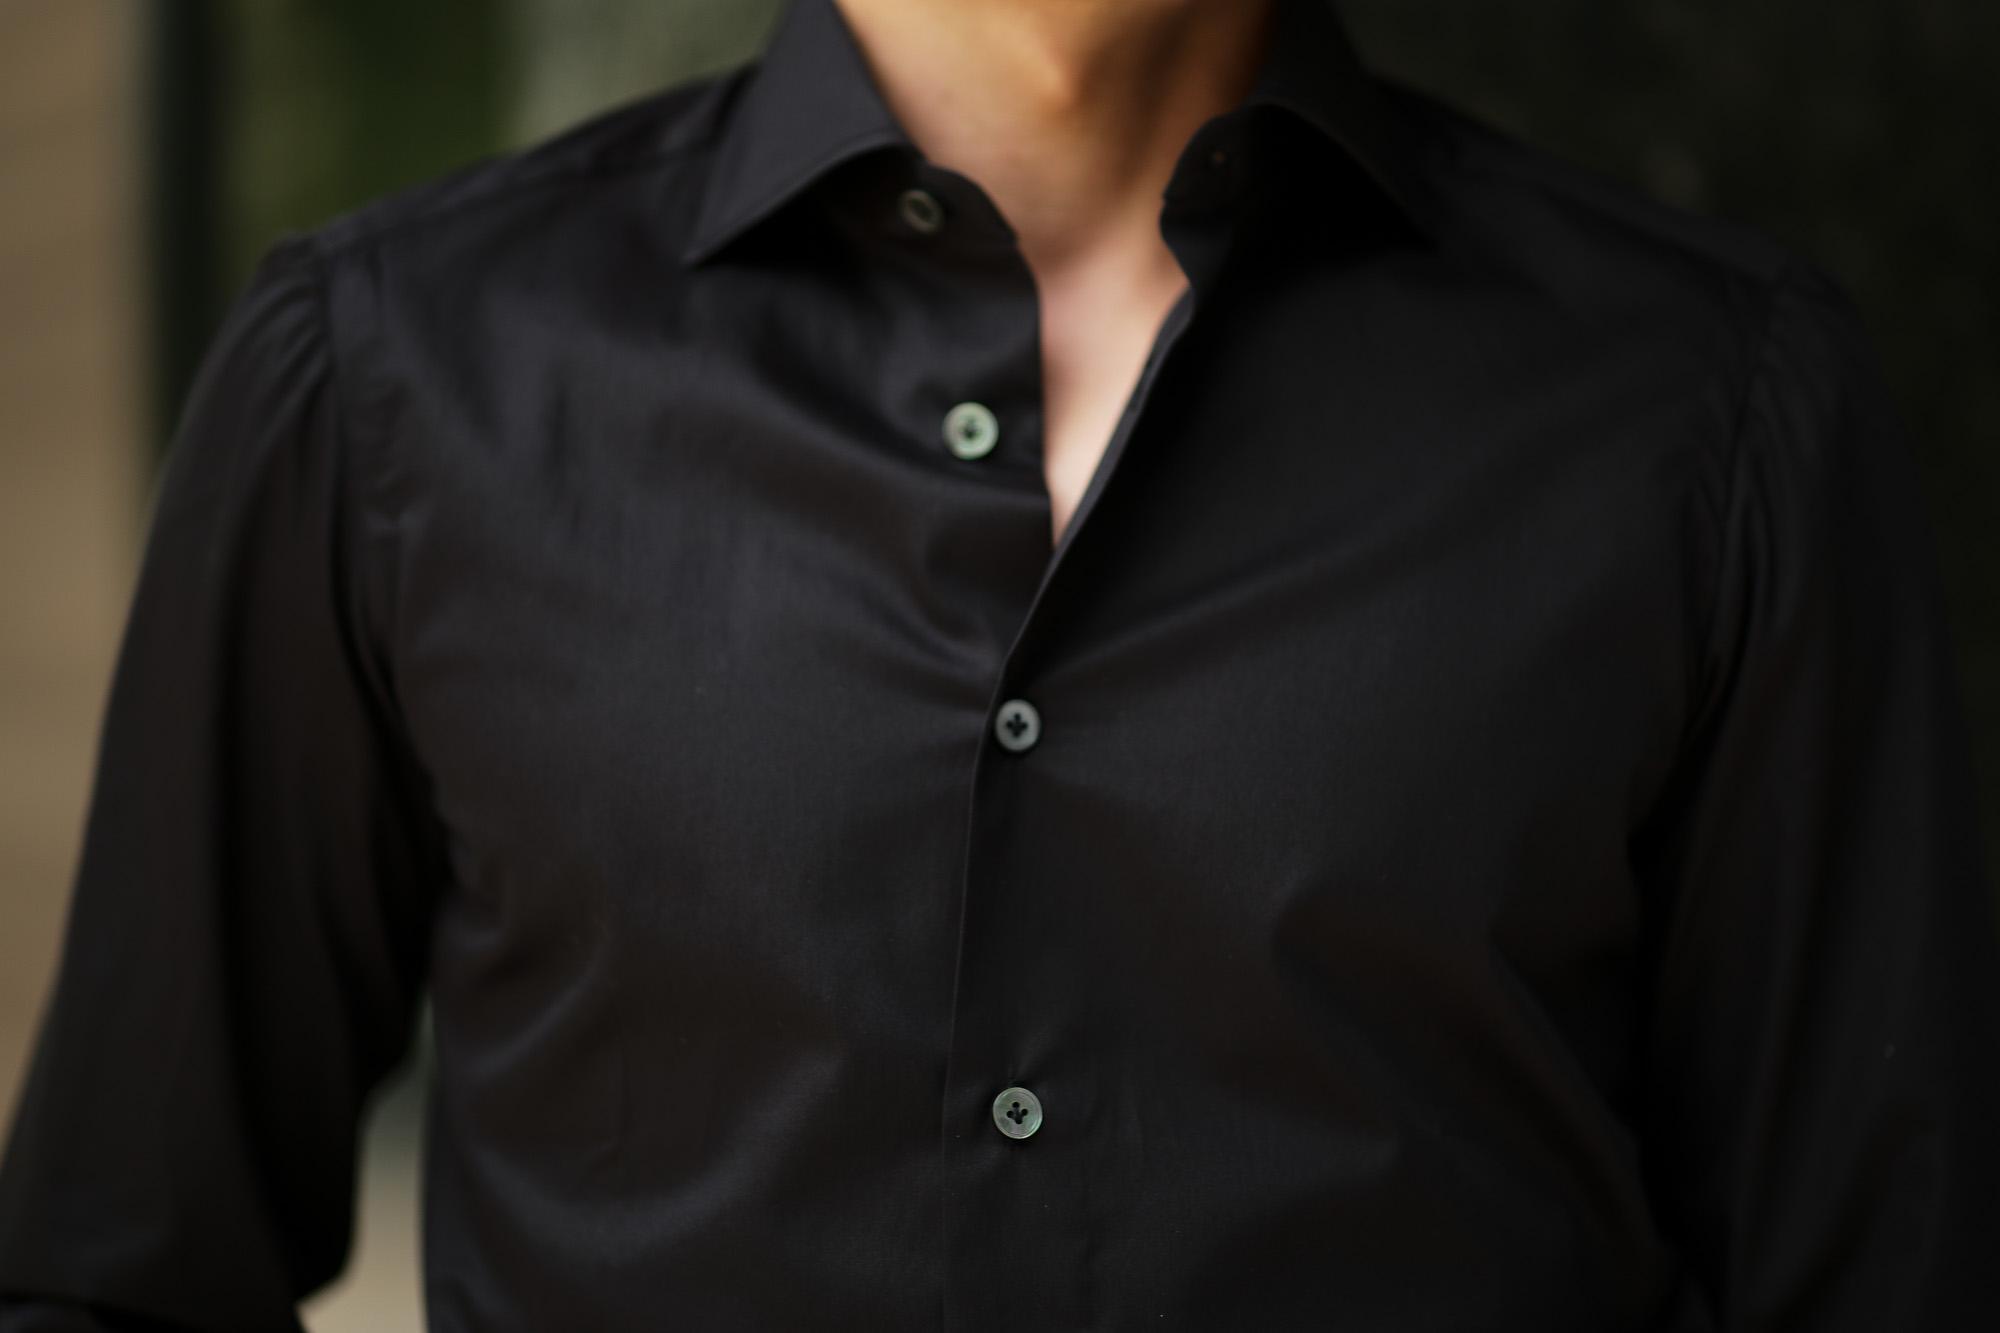 AVINO(アヴィーノ) Poplin Dress Shirts コットン ブロード ポプリン ドレスシャツ BLACK(ブラック) made in italy (イタリア製) 2019 秋冬 【ご予約受付中】  愛知 名古屋 altoediritto アルトエデリット